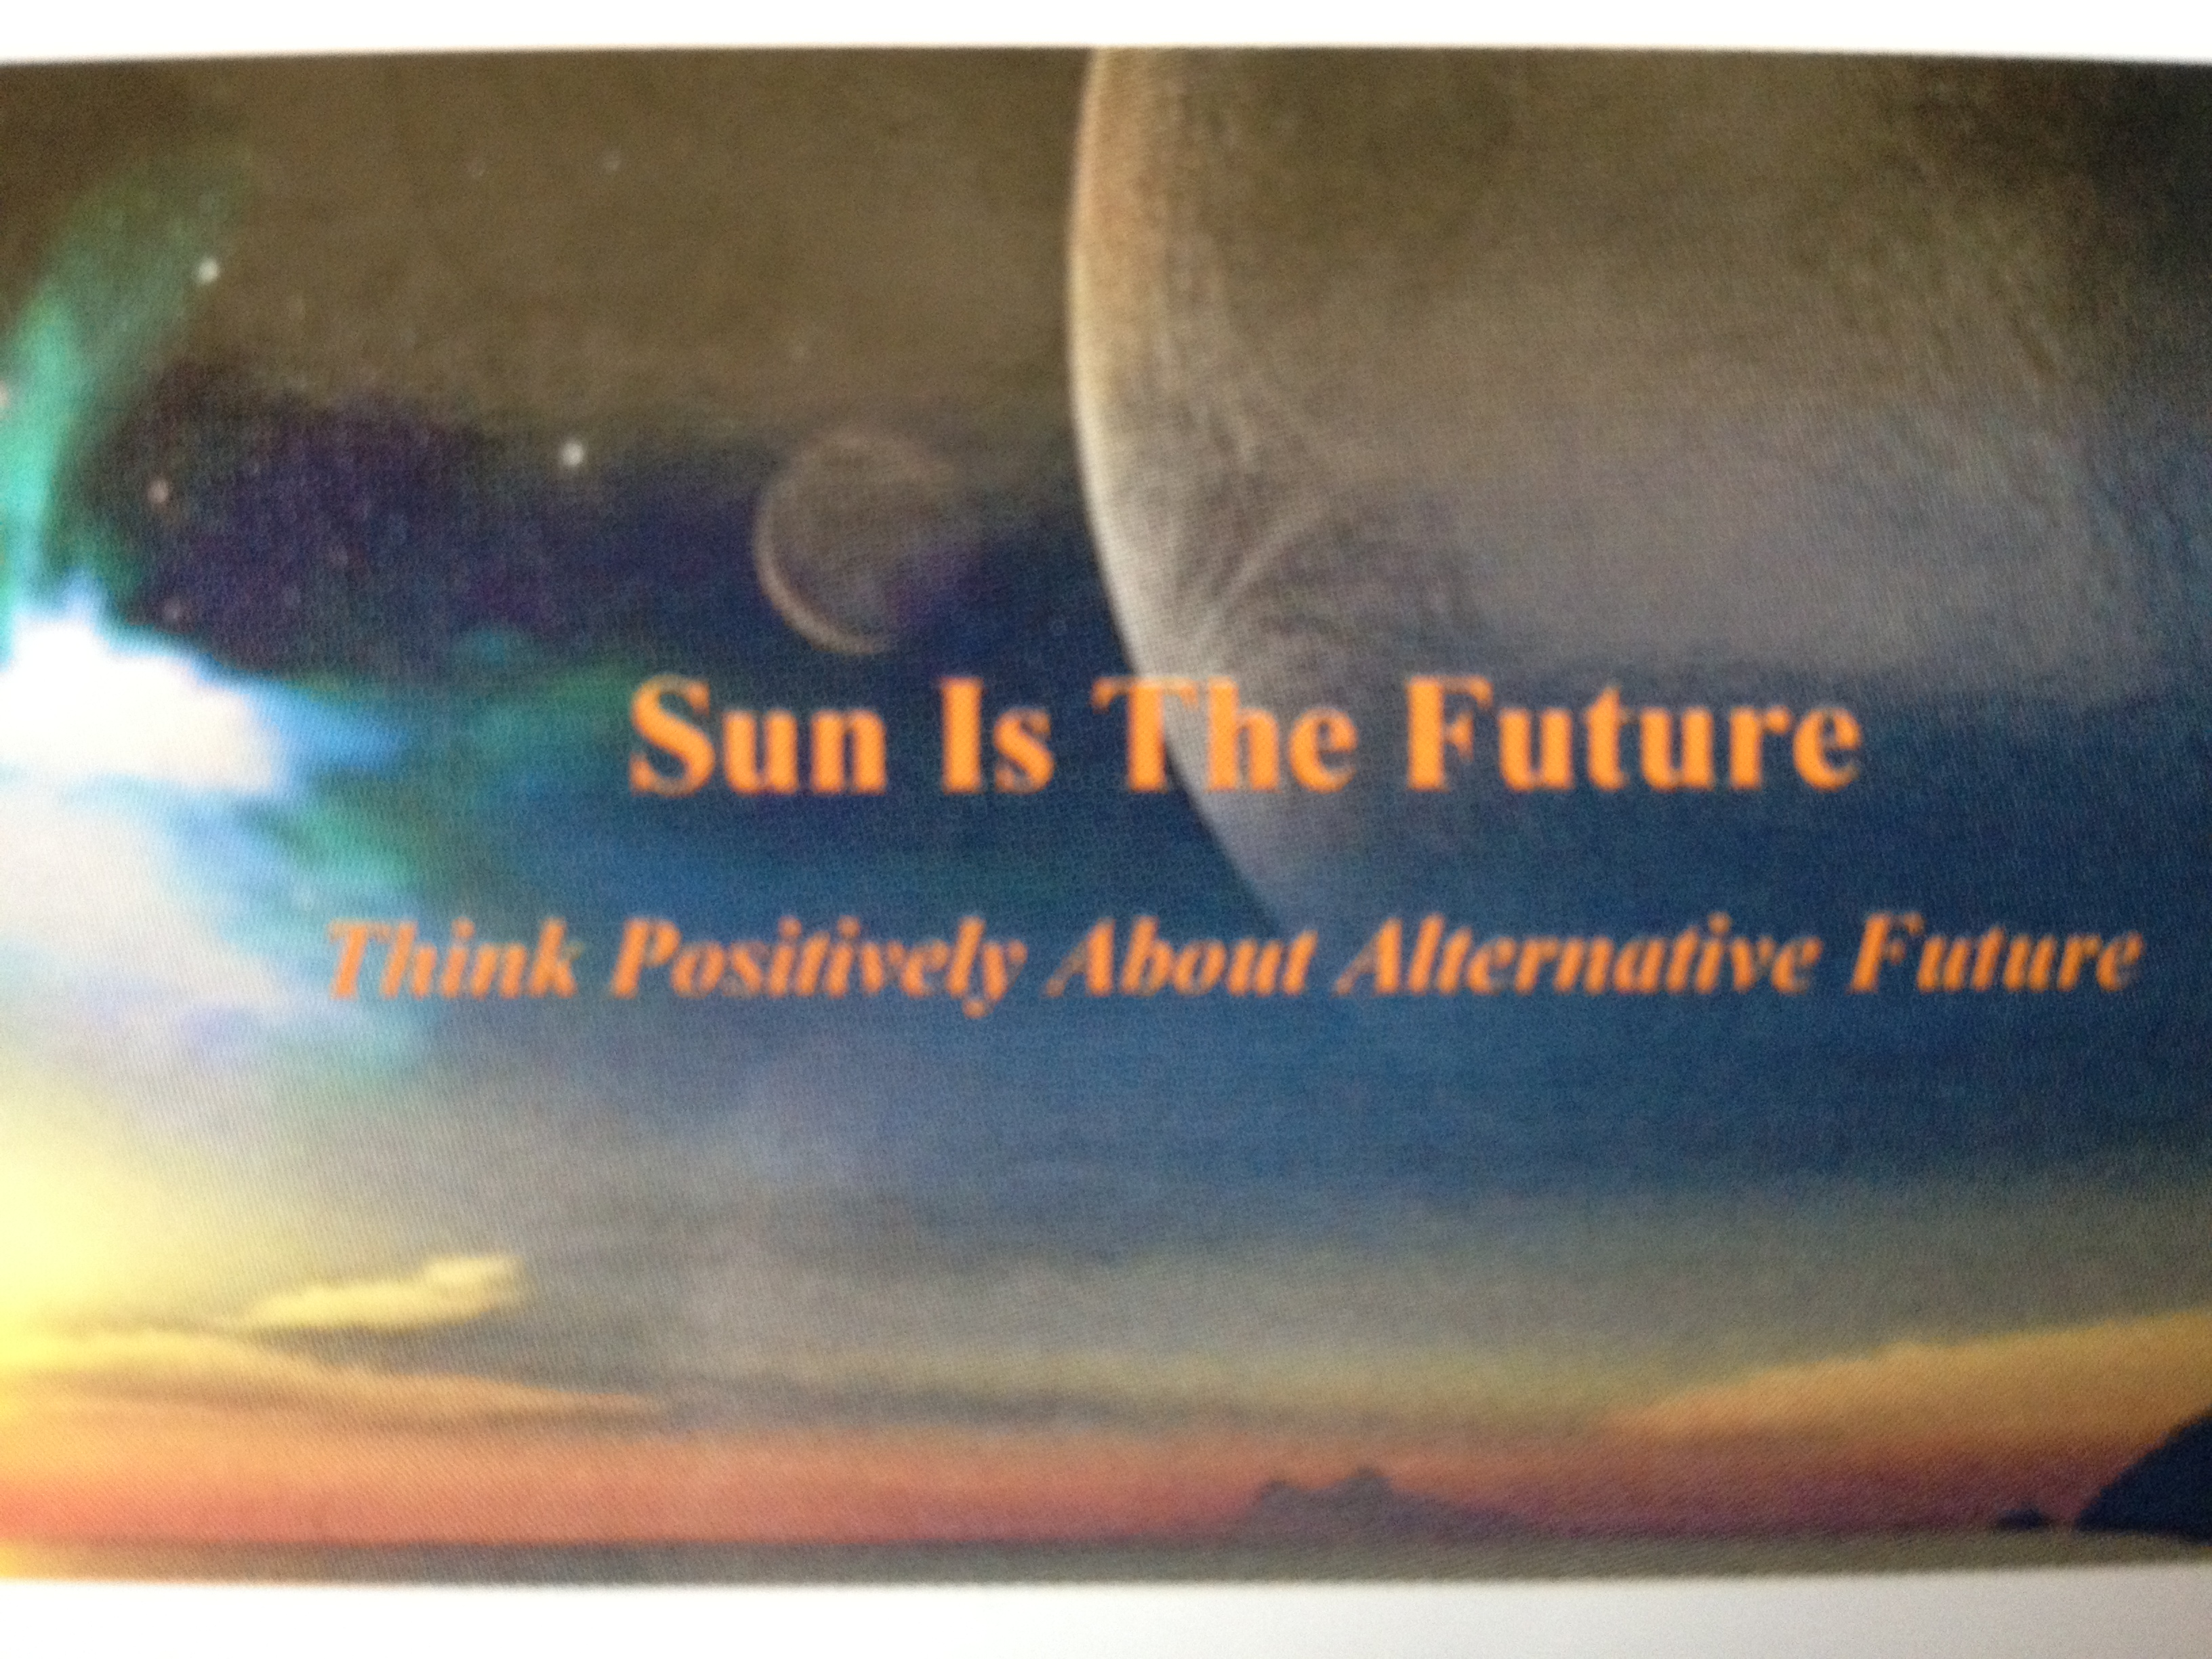 Sun Is The Future card